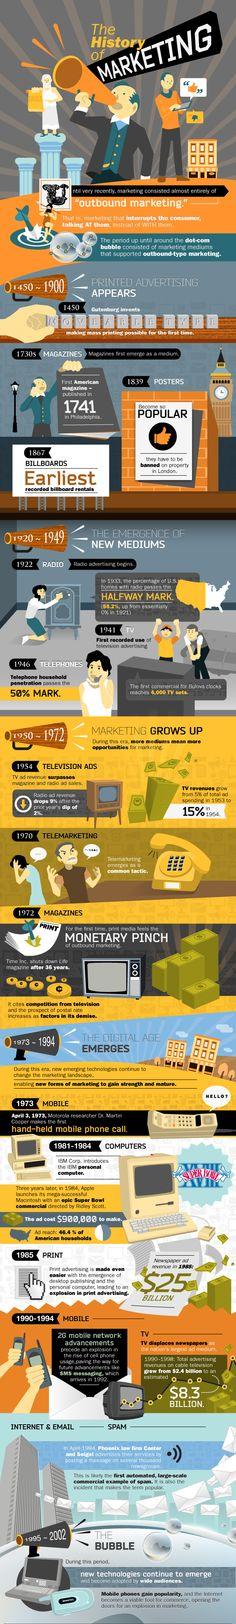 The history of marketing.